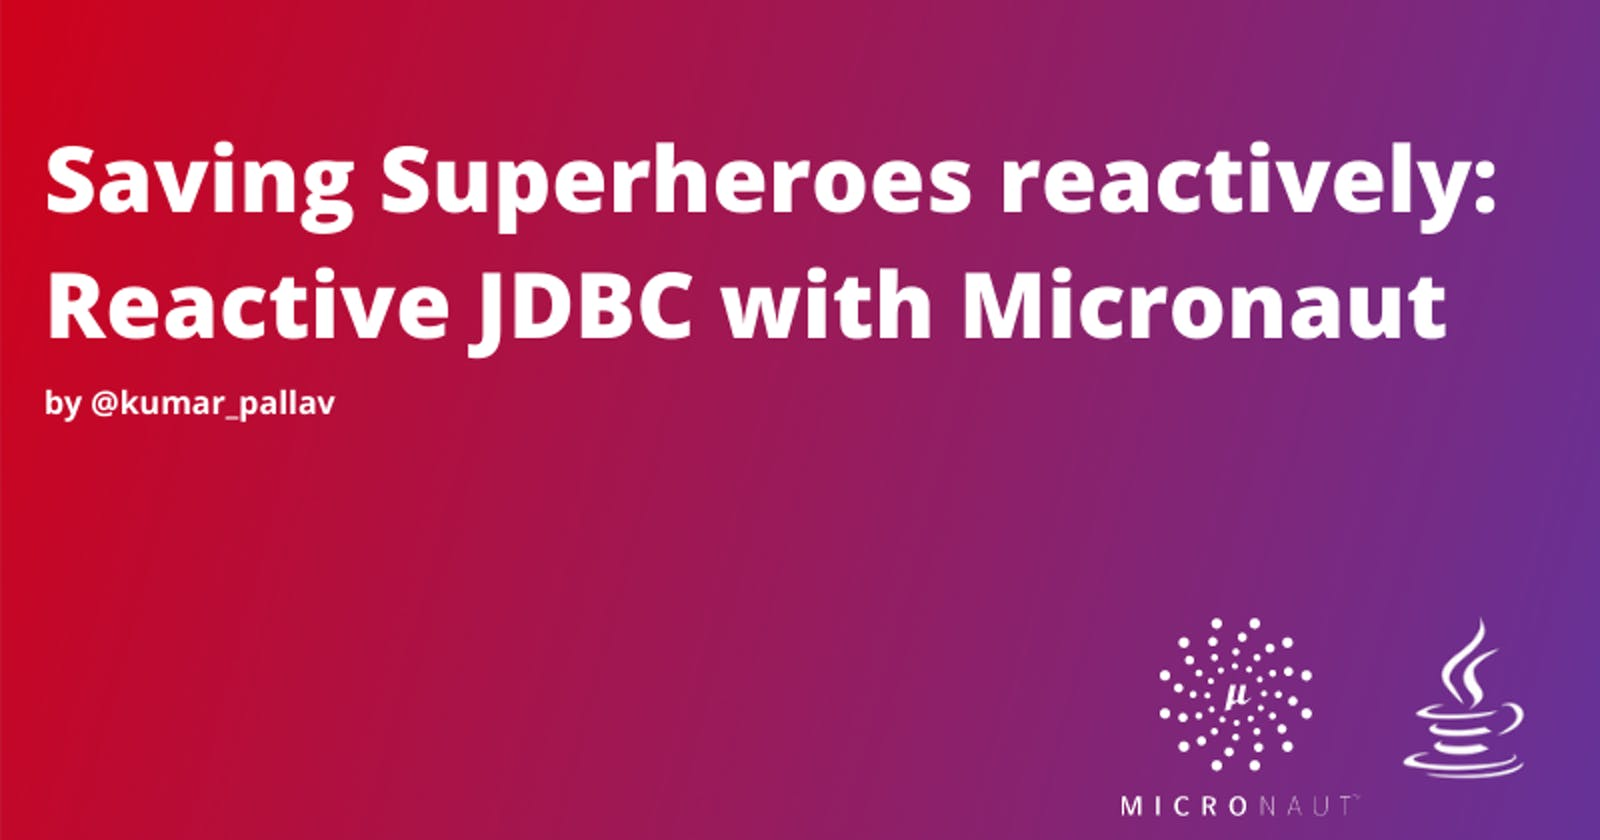 Saving Superheroes reactively: Reactive JDBC with Micronaut